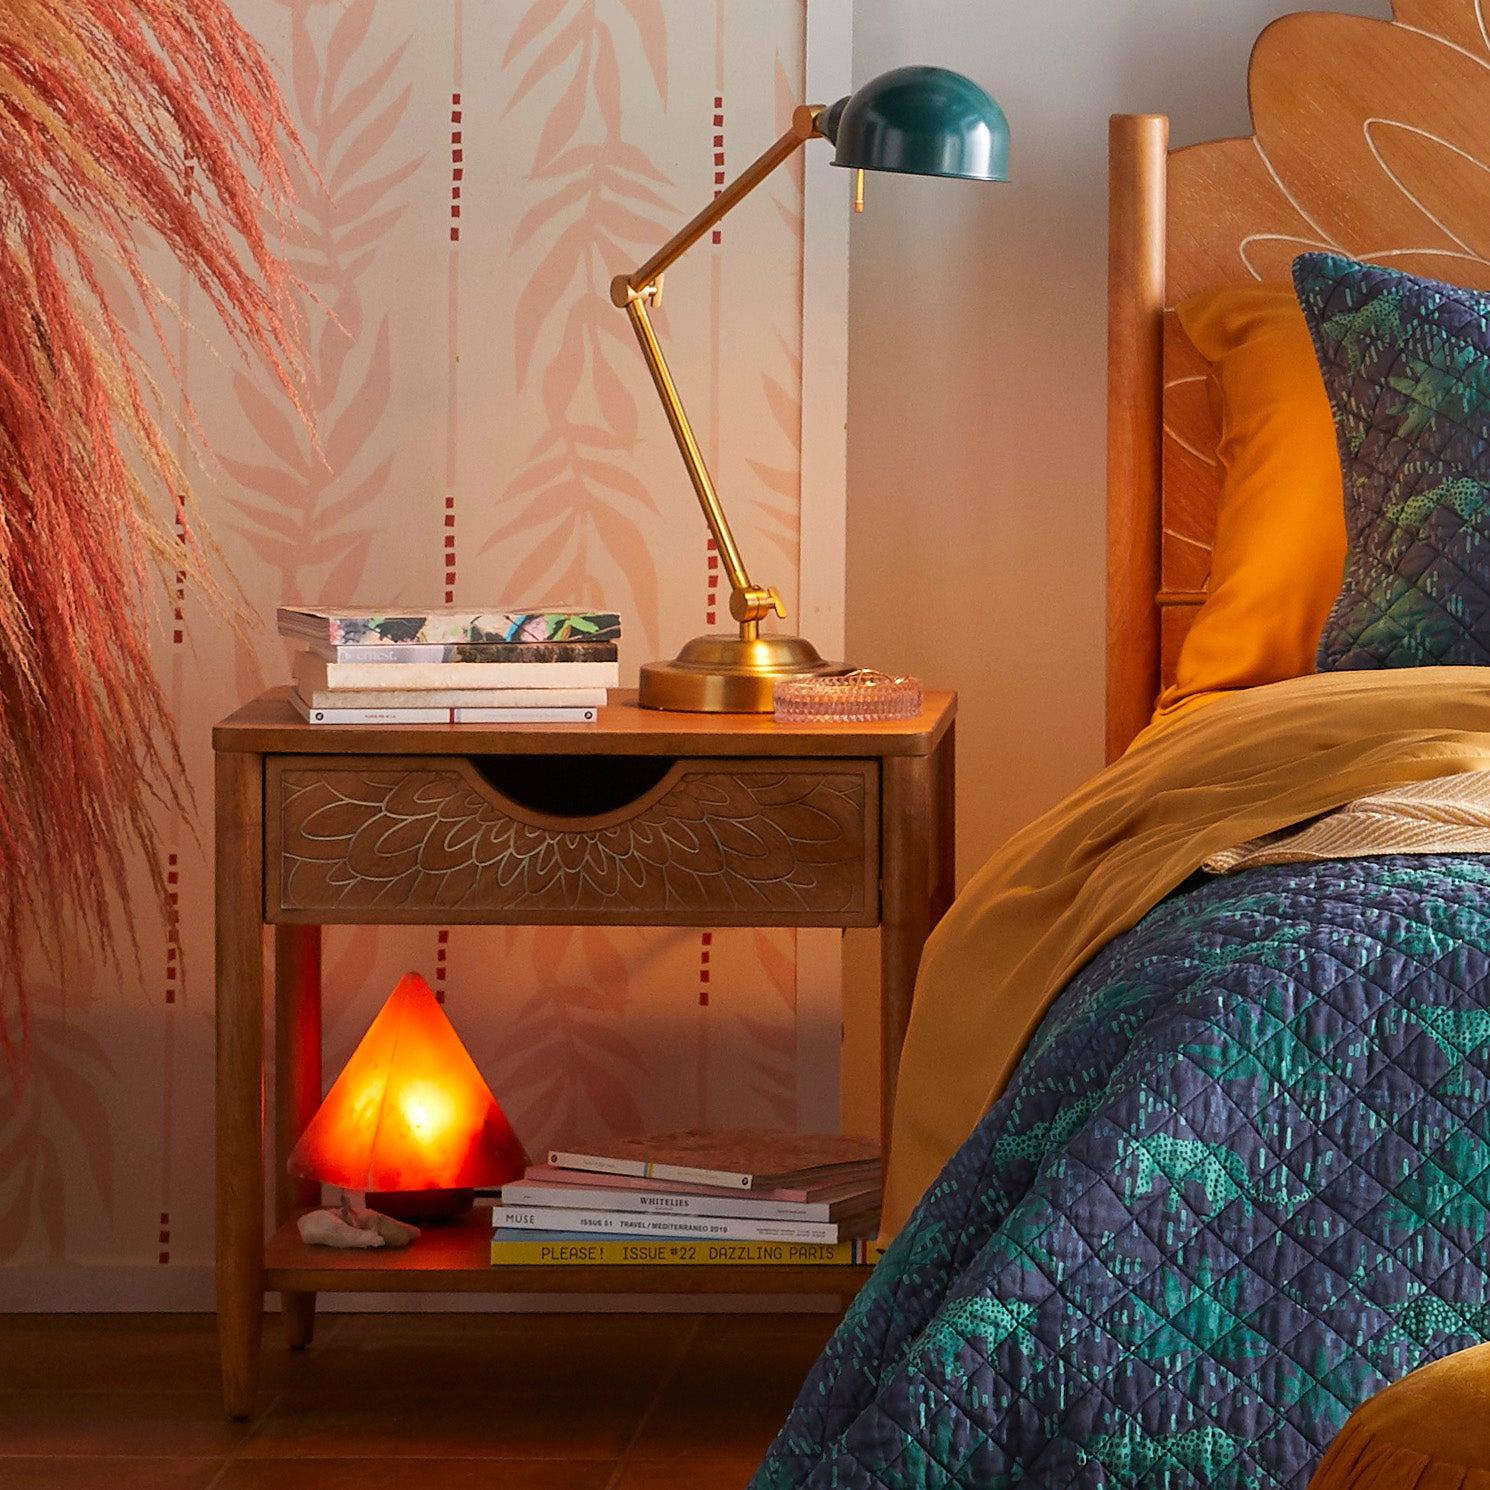 Drew Barrymore Flower Home Bohemian Carved Wood Nightstand